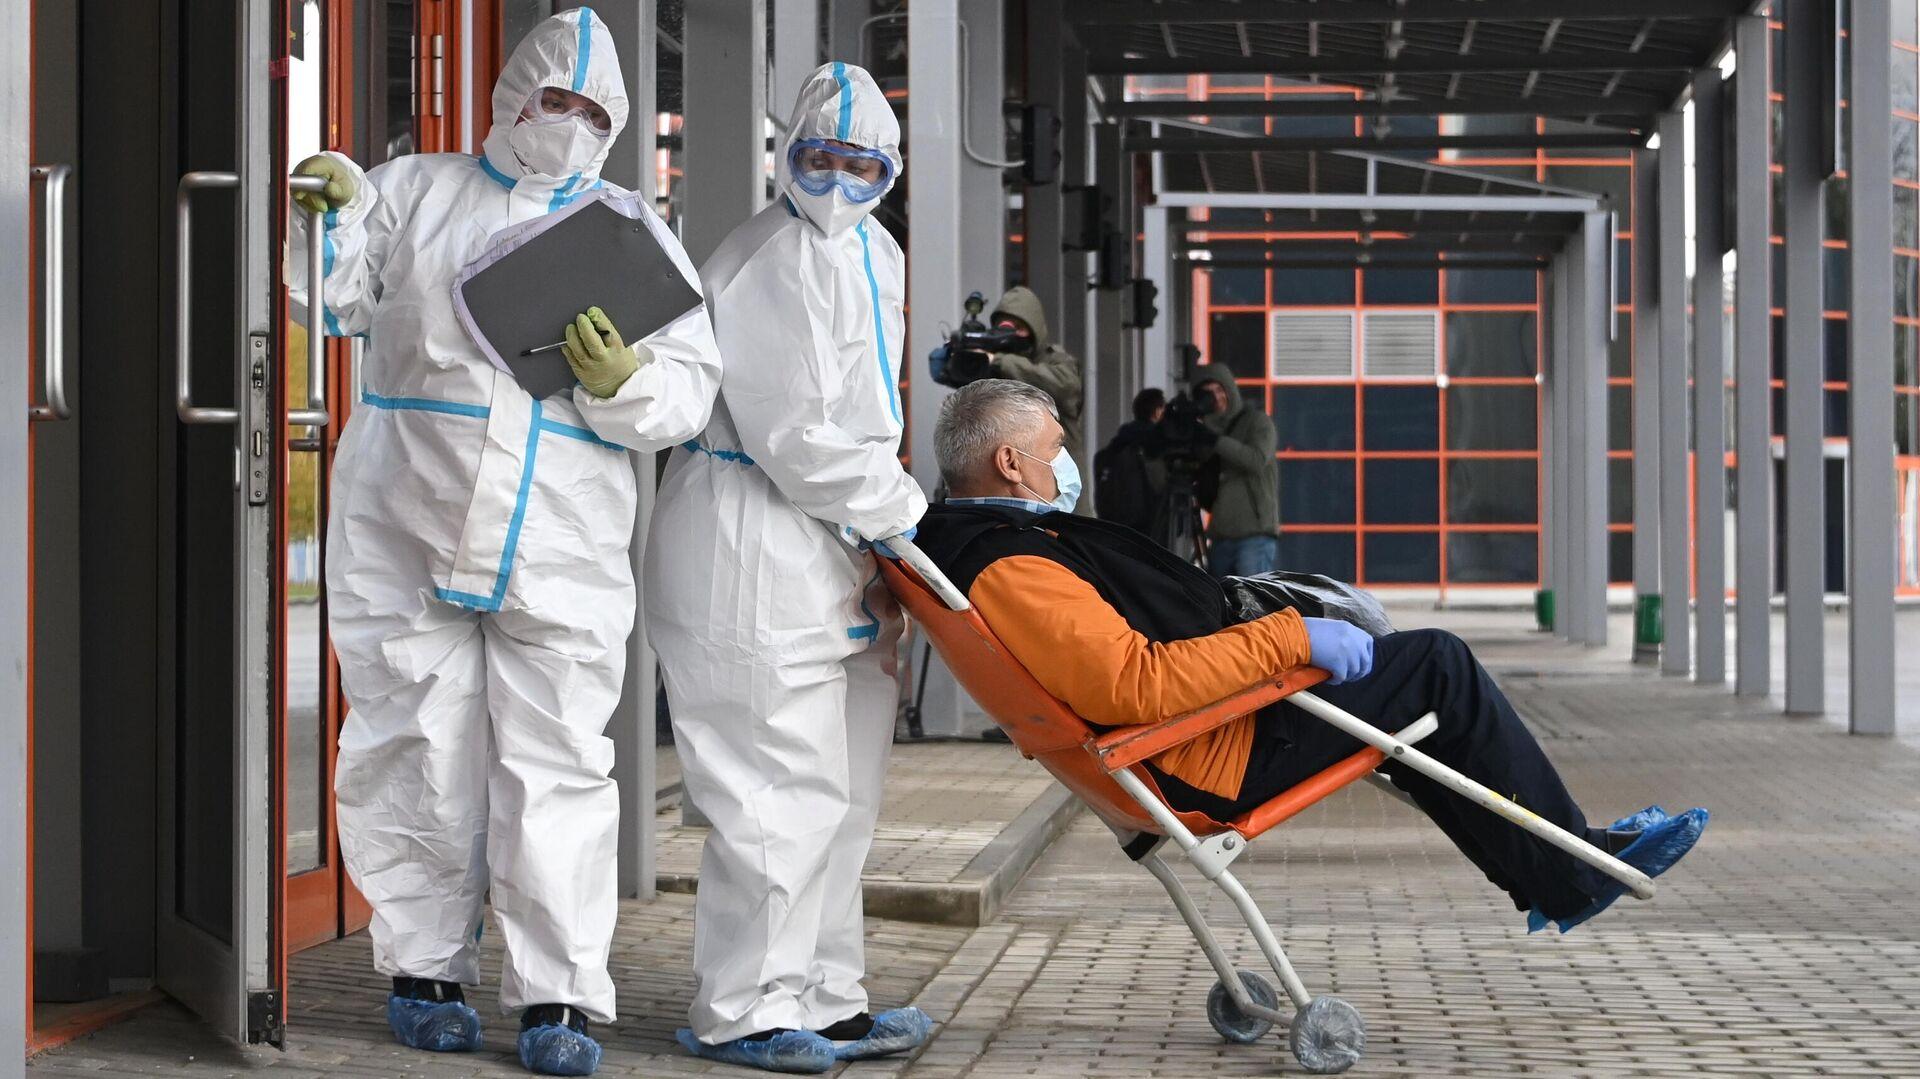 Сотрудники скорой помощи доставляют пациента во временный госпиталь COVID-19 на ВДНХ - РИА Новости, 1920, 05.11.2020